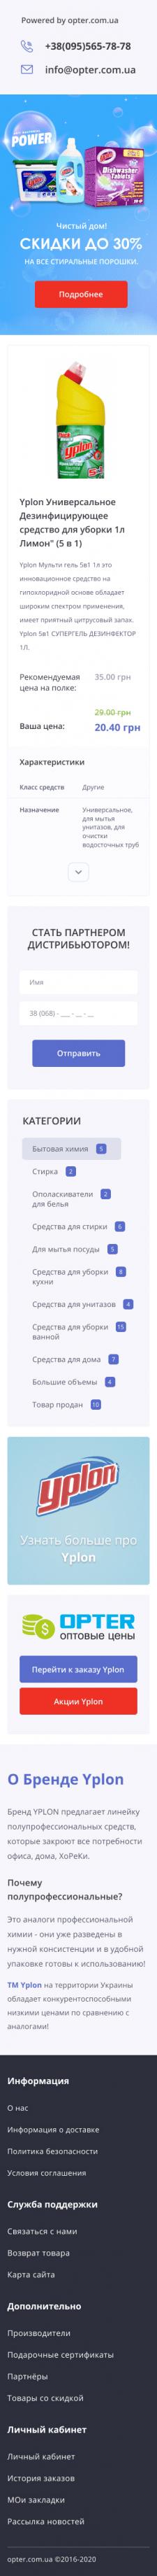 Yplon_mobile